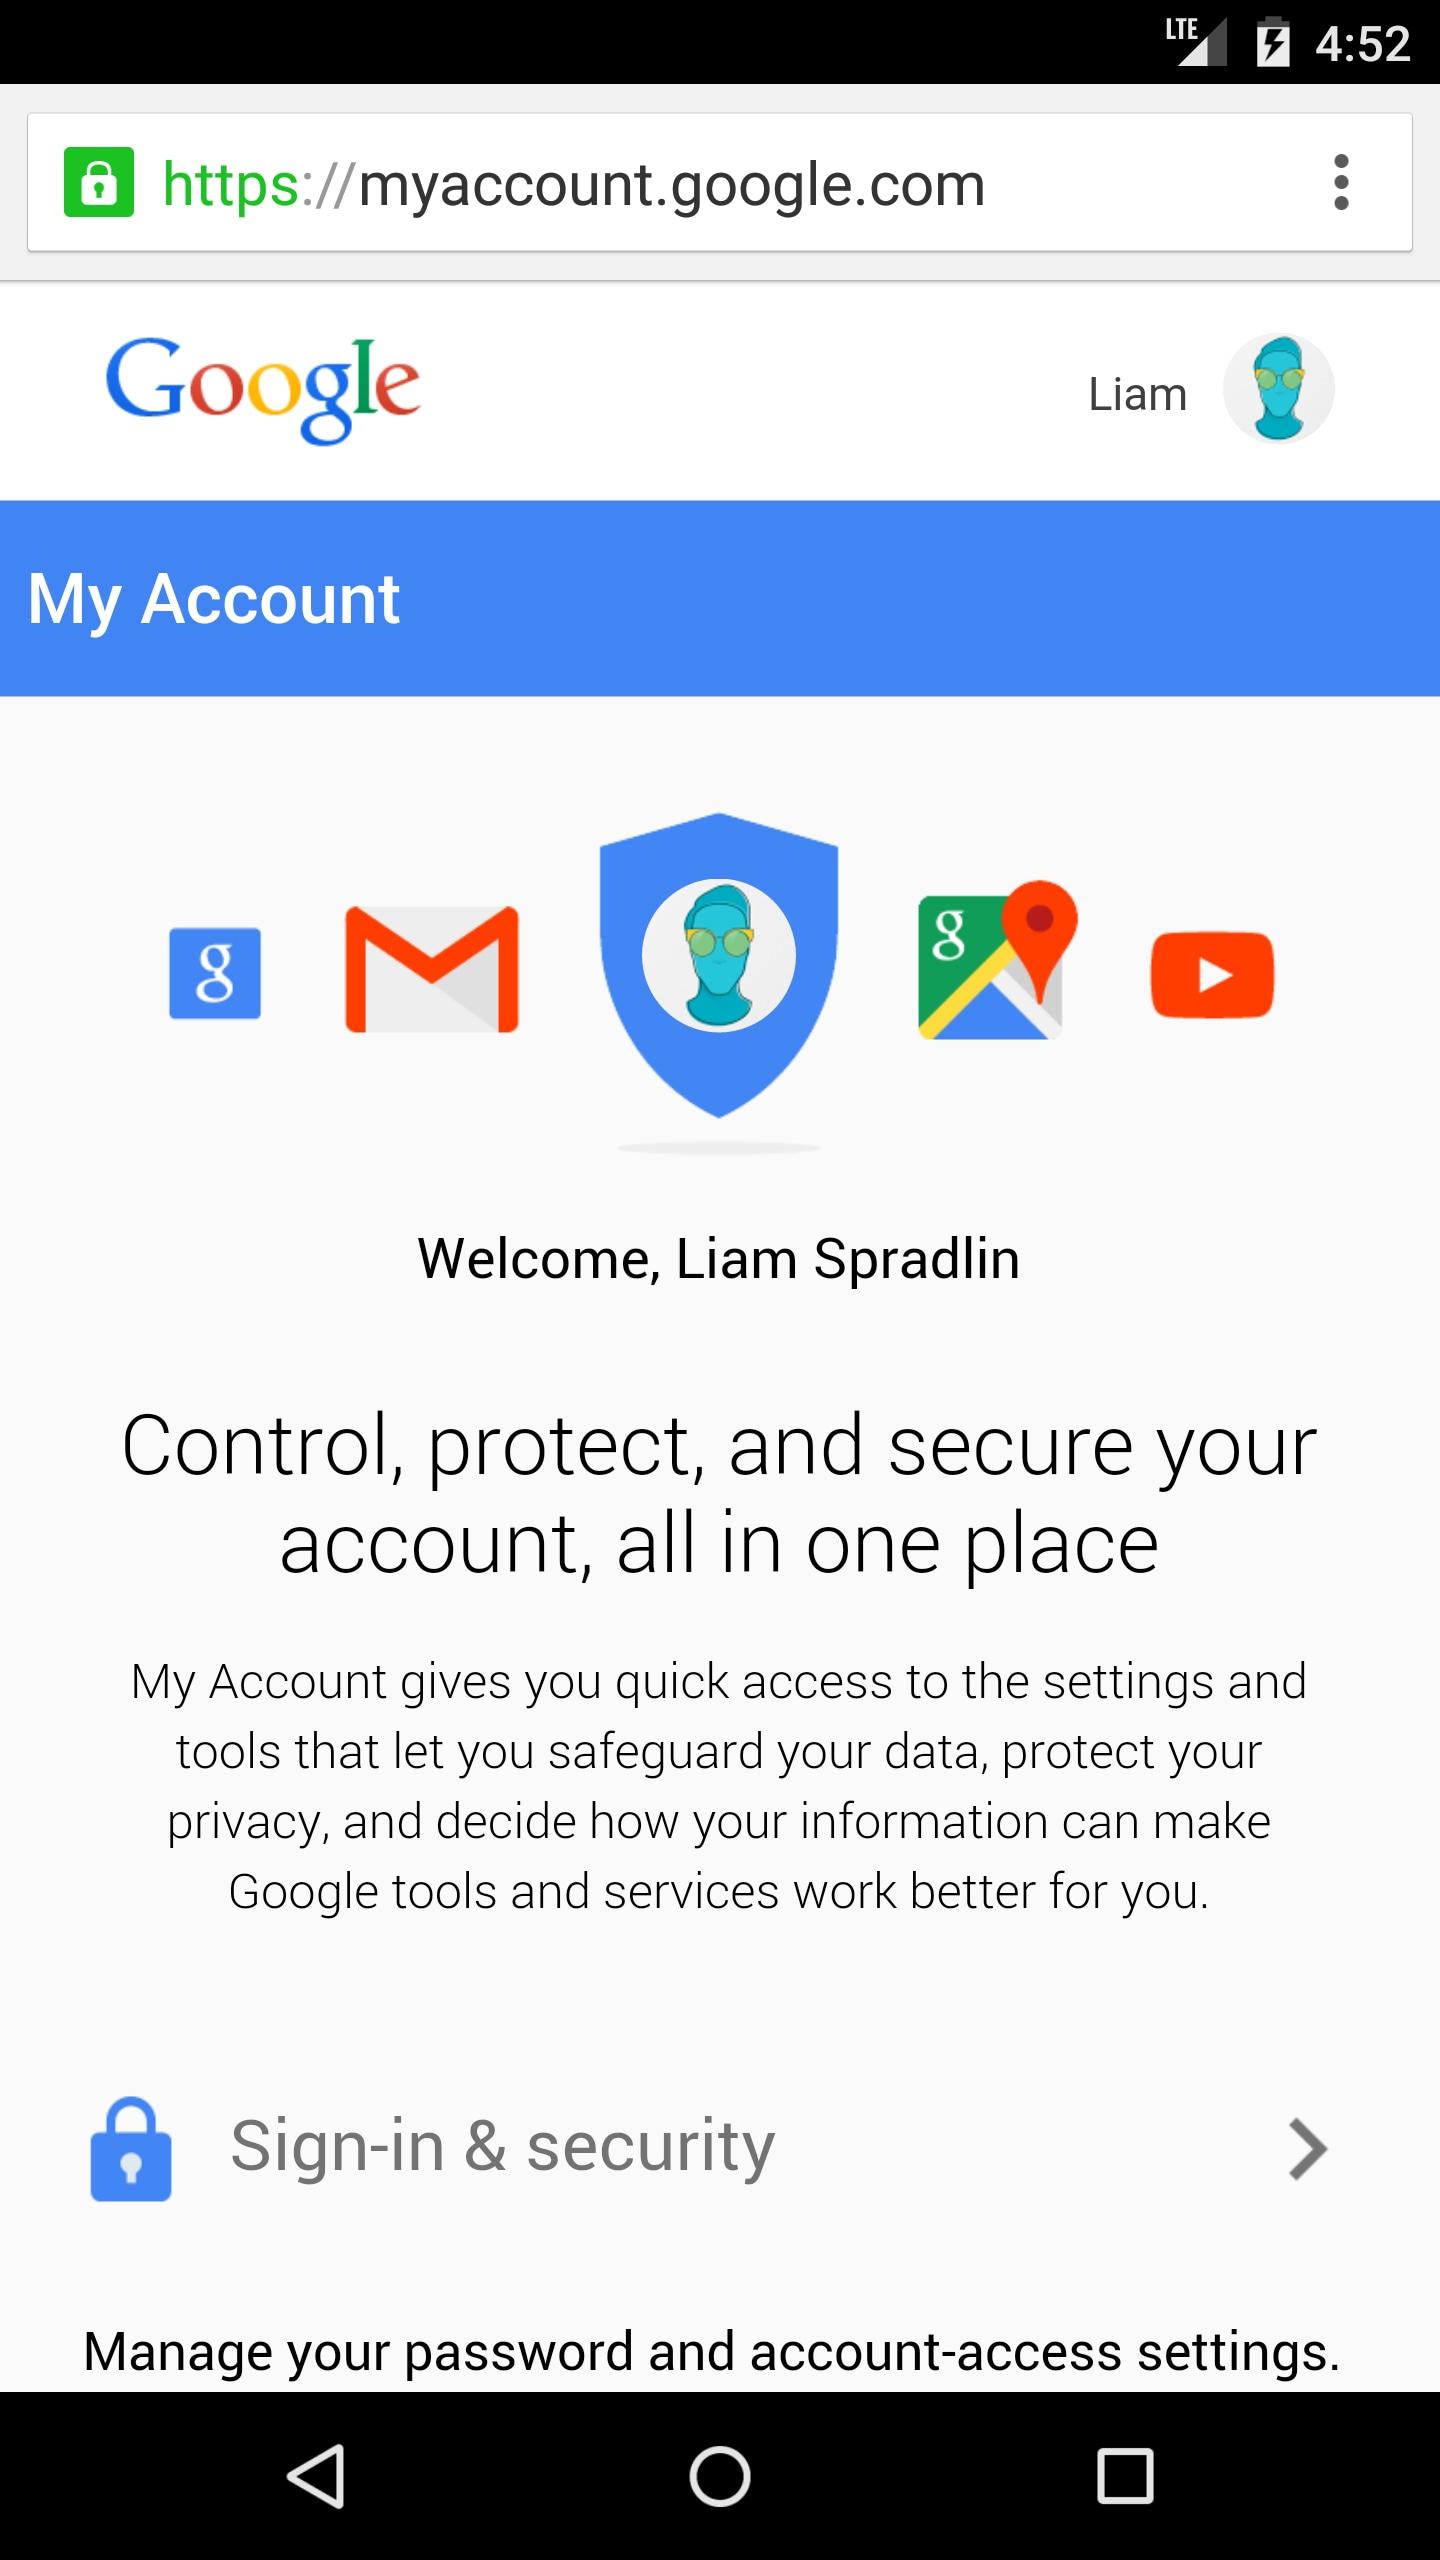 Google My Account redesign – 2